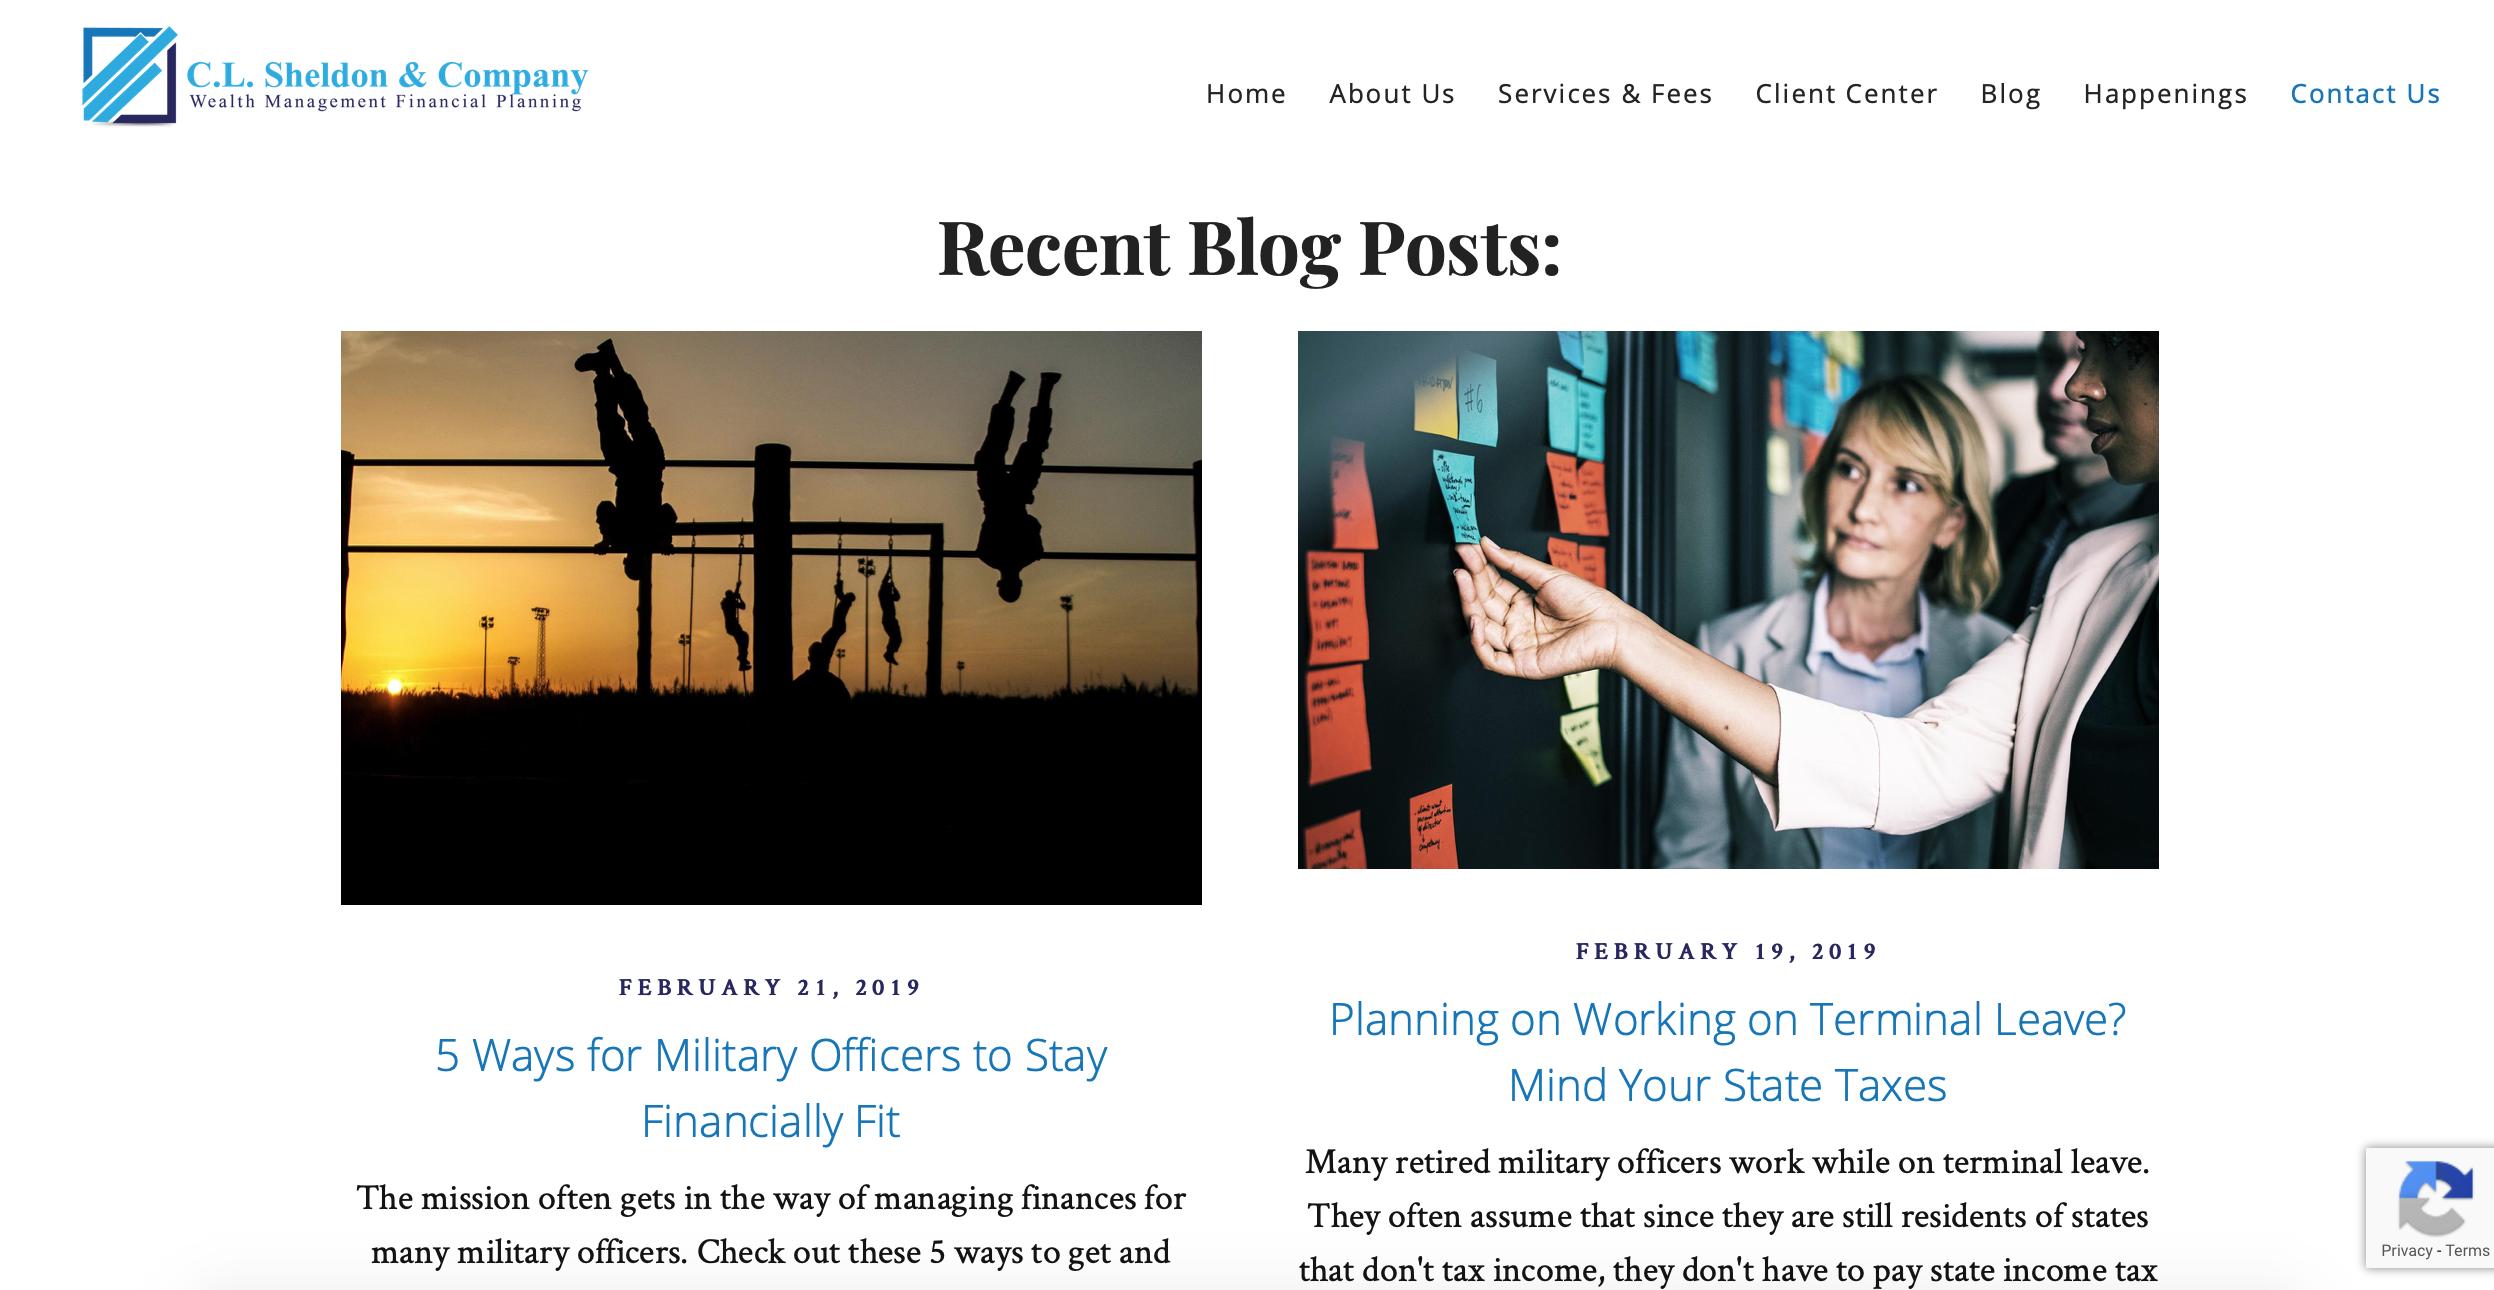 C.L. Sheldon & Company, advisor blog